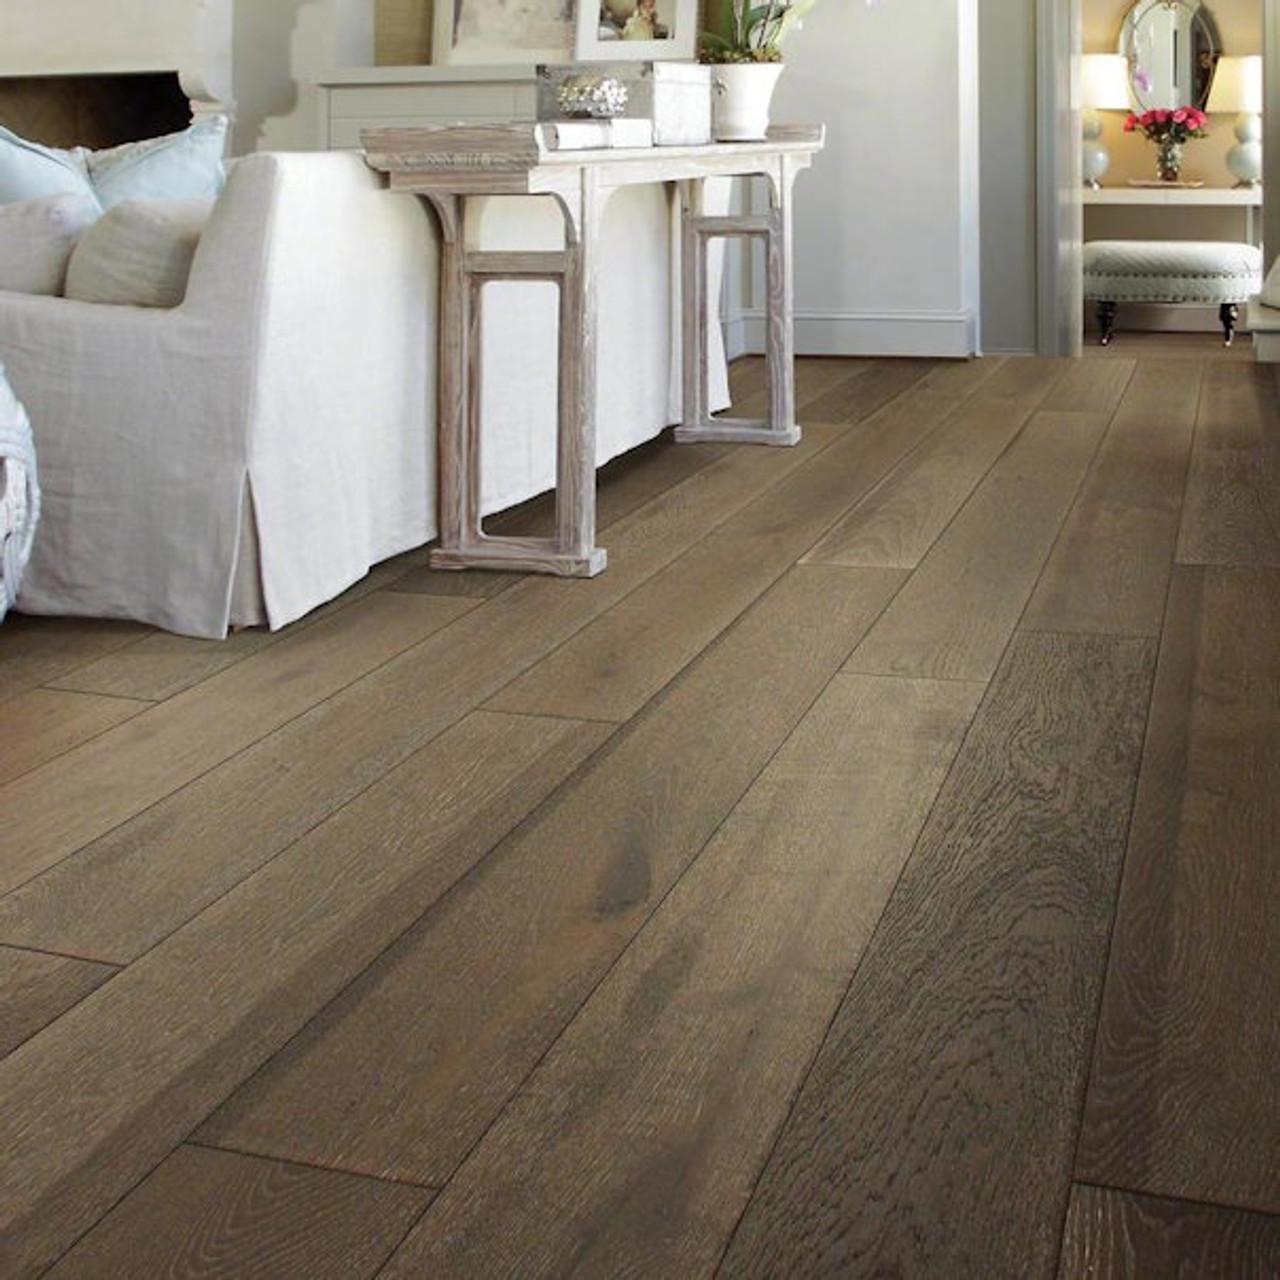 Shaw Grayson Oak 7 48 In Bell Tower Oak Engineered Hardwood Flooring 31 09 Sq Ft